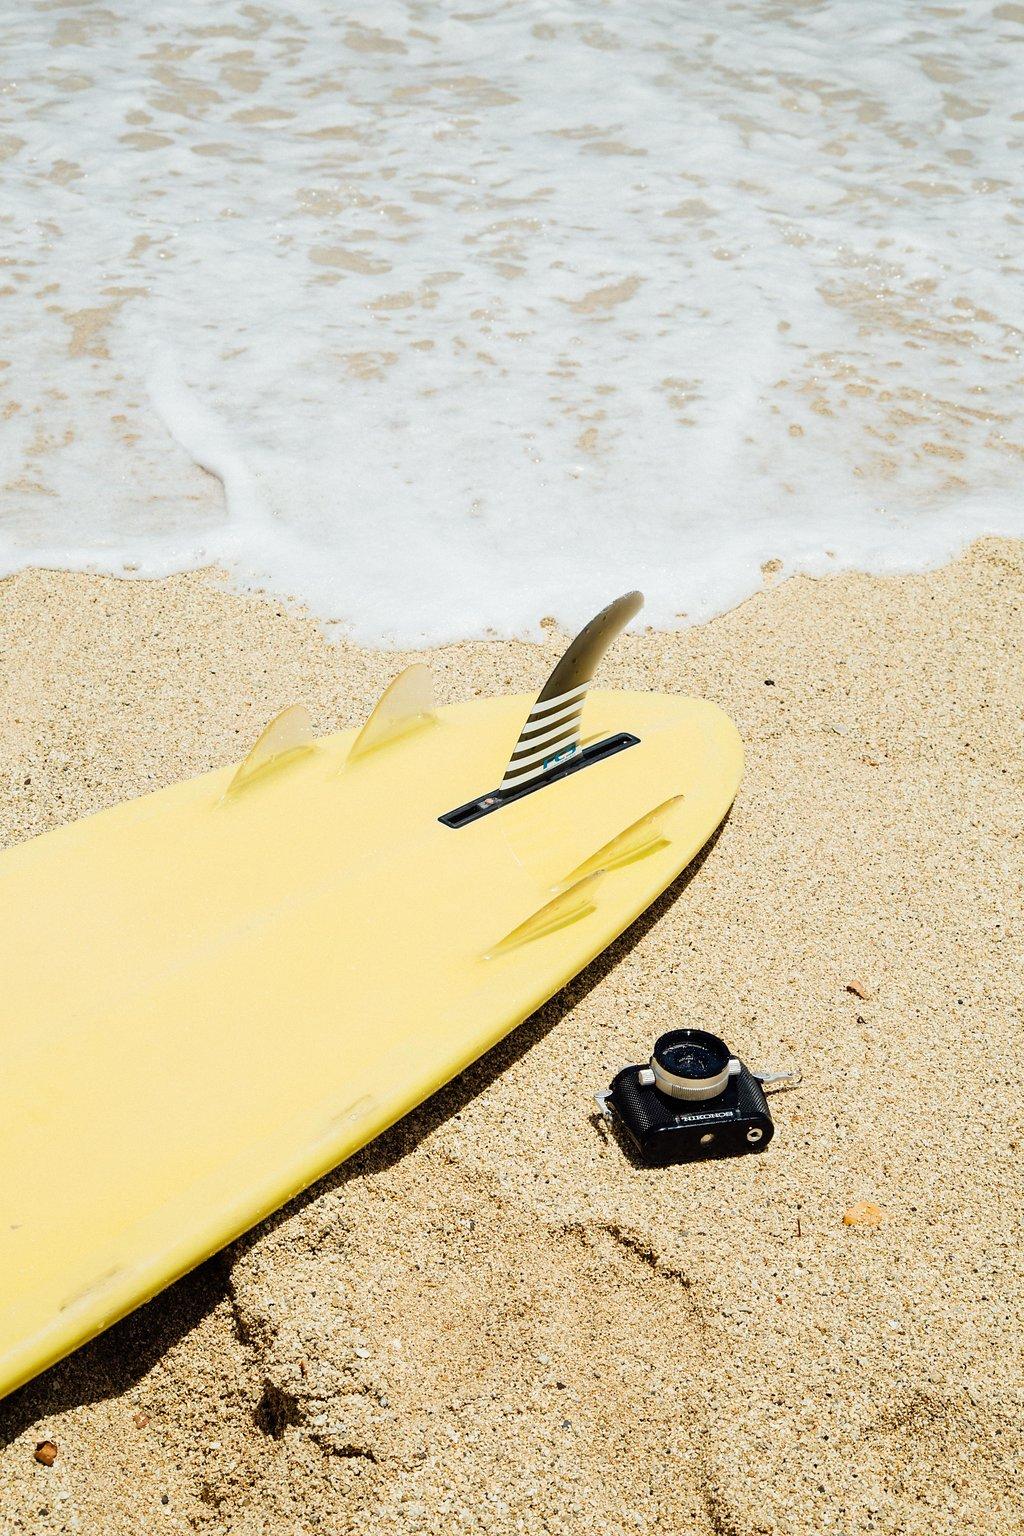 Boxjelly-yellow-Surfboard-camera-shore